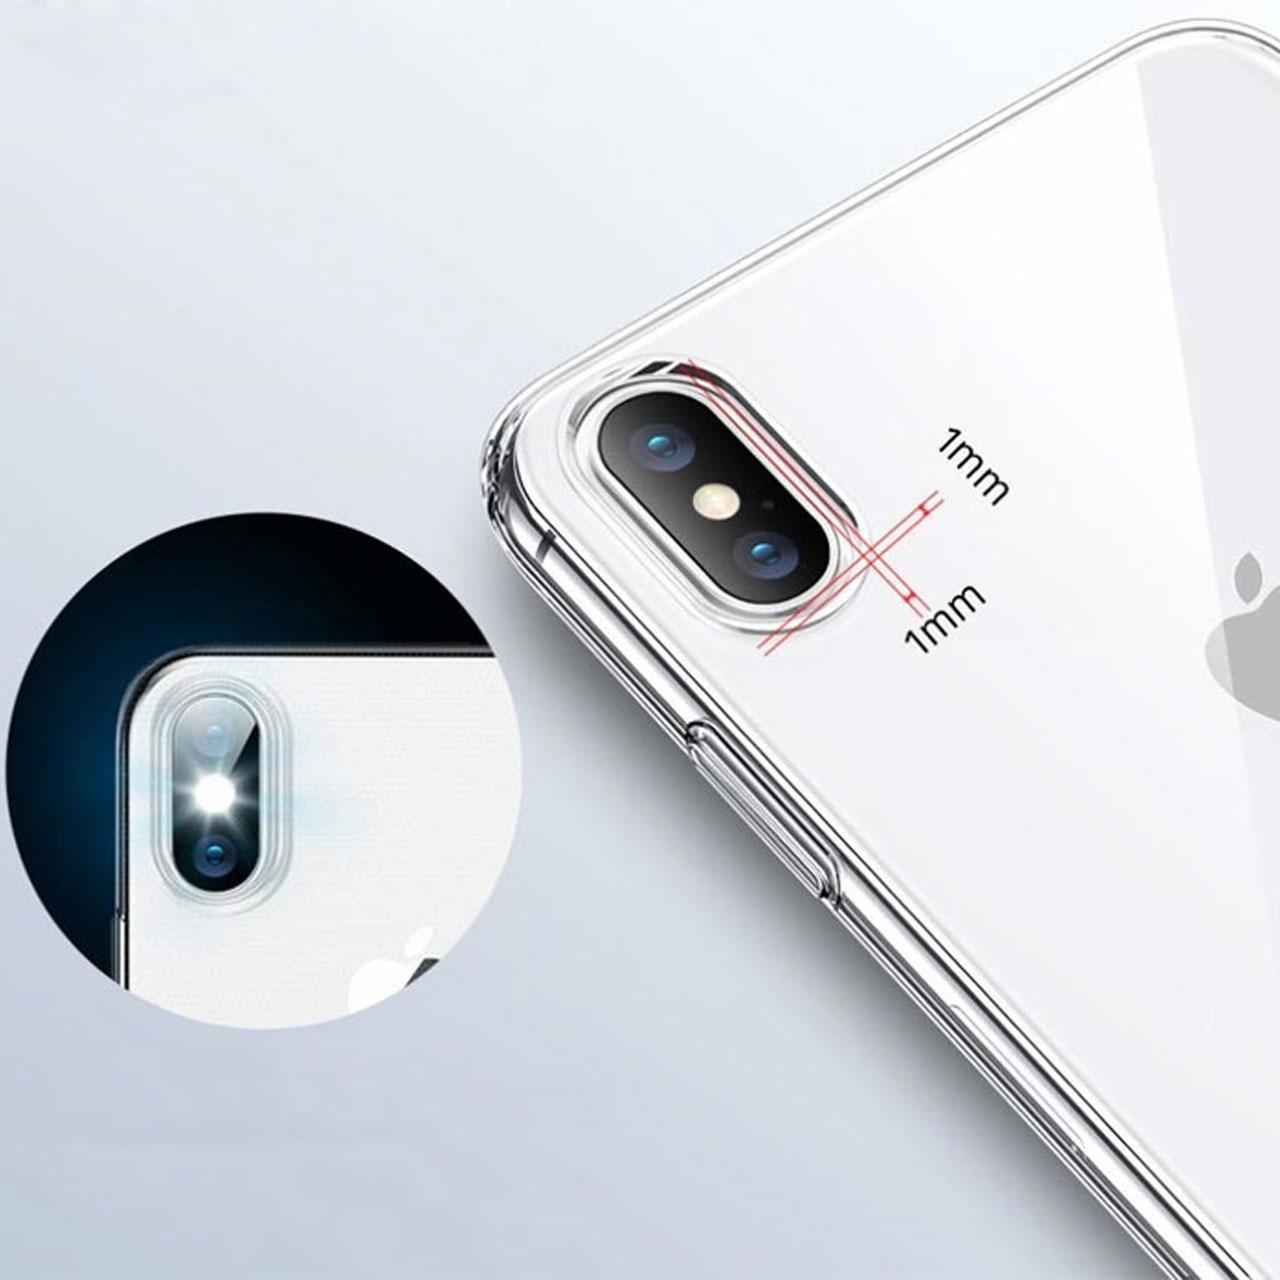 کاور مدل BLKN مناسب برای گوشی موبایل اپل iPhone XS Max main 1 6